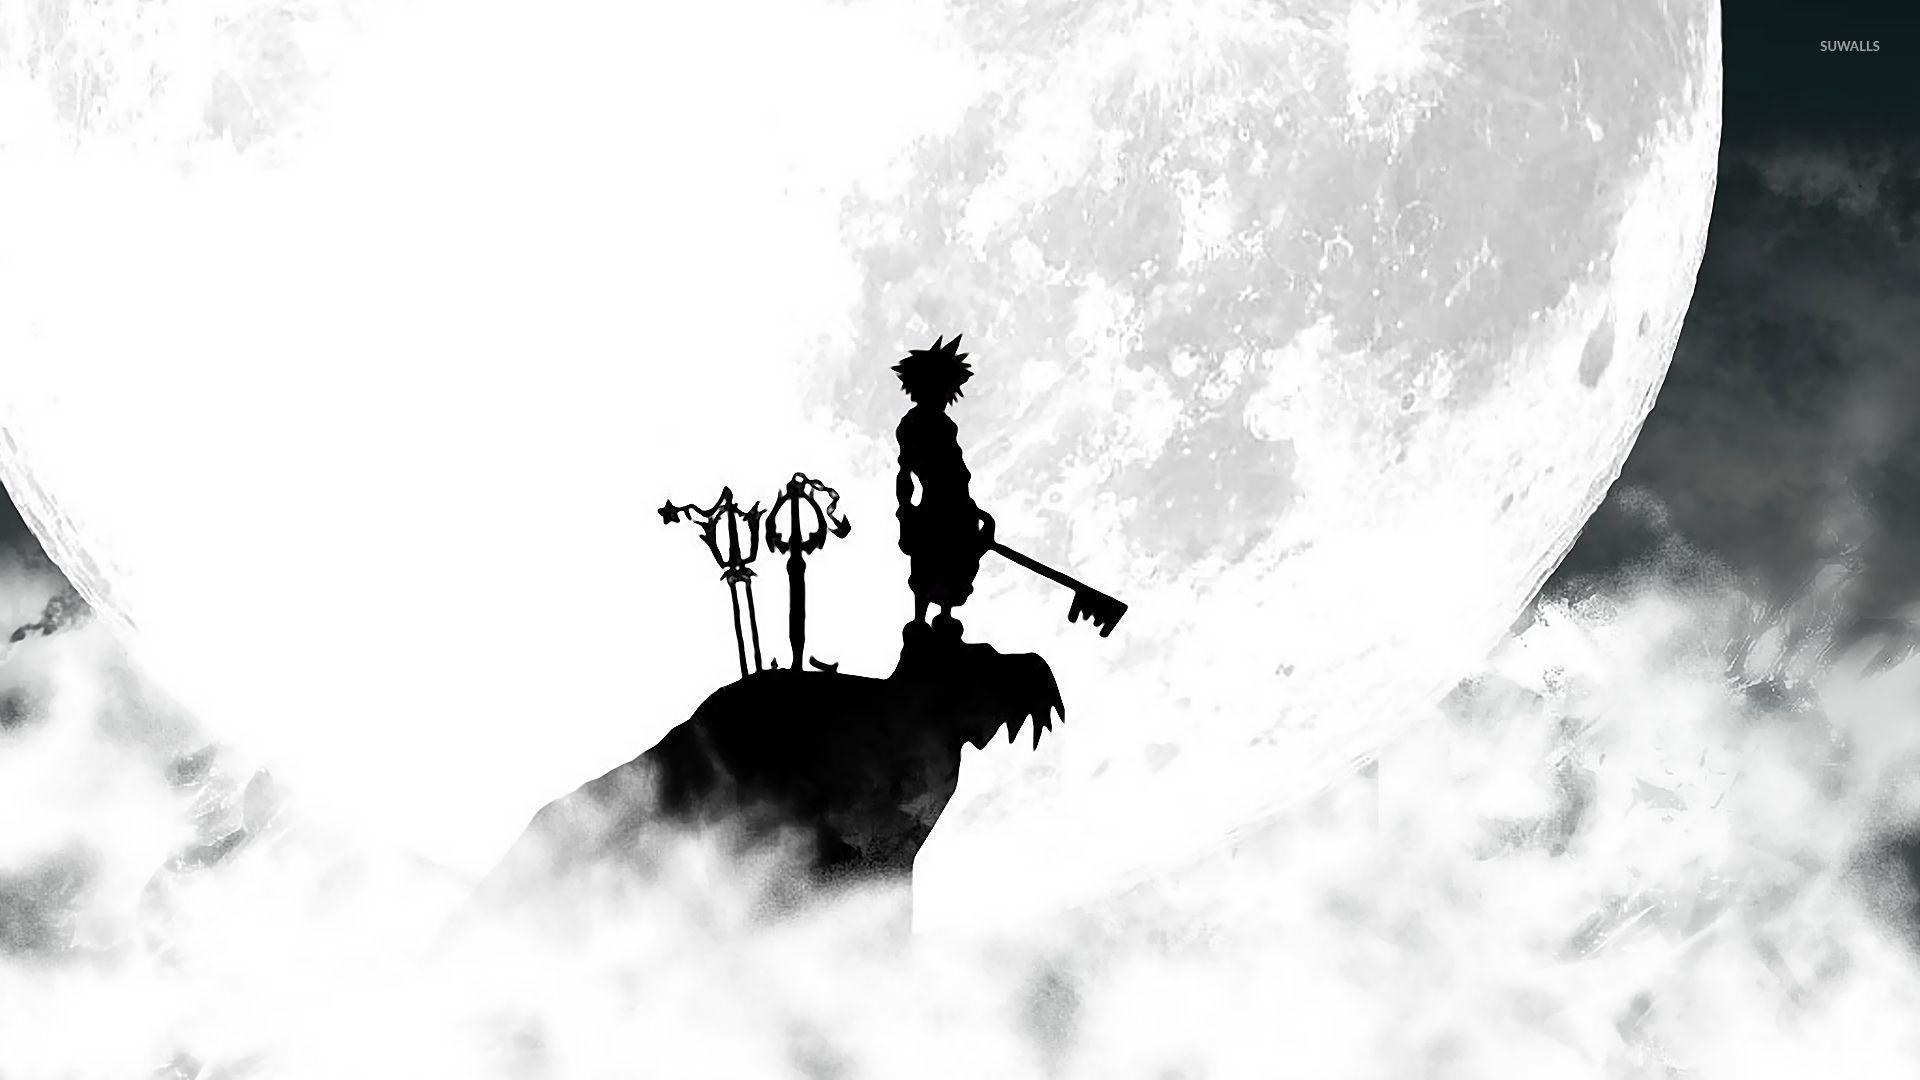 Kingdom Hearts III Wallpapers - Wallpaper Cave